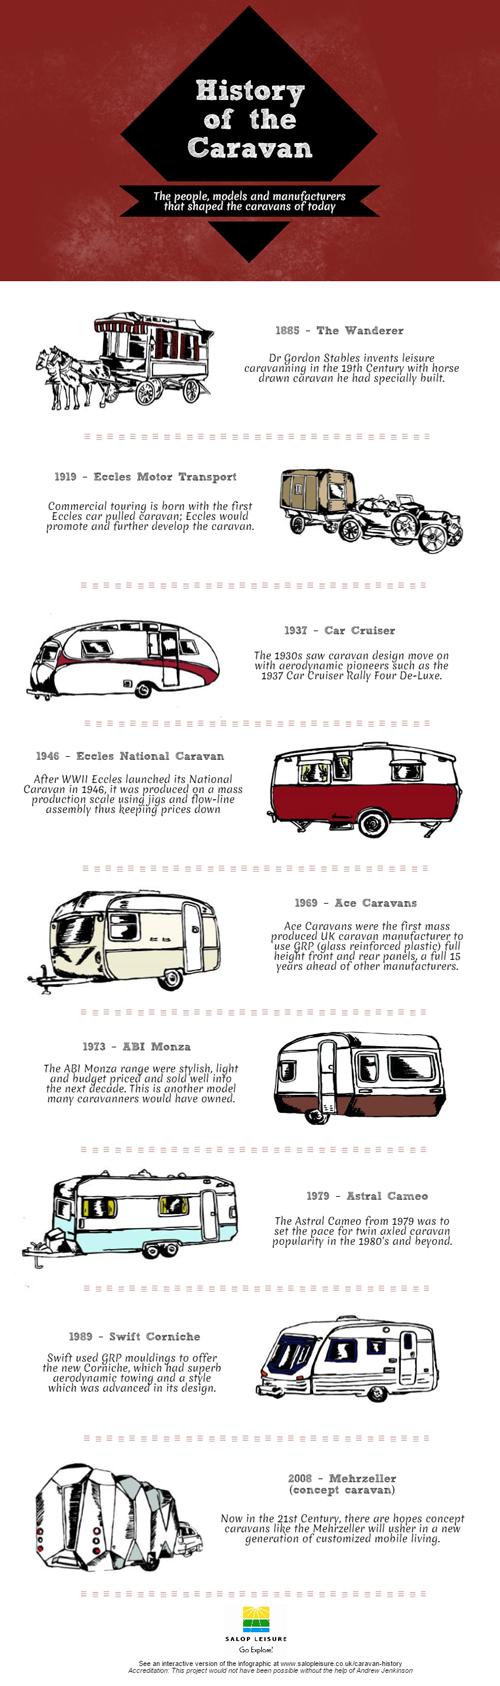 History of the Caravan